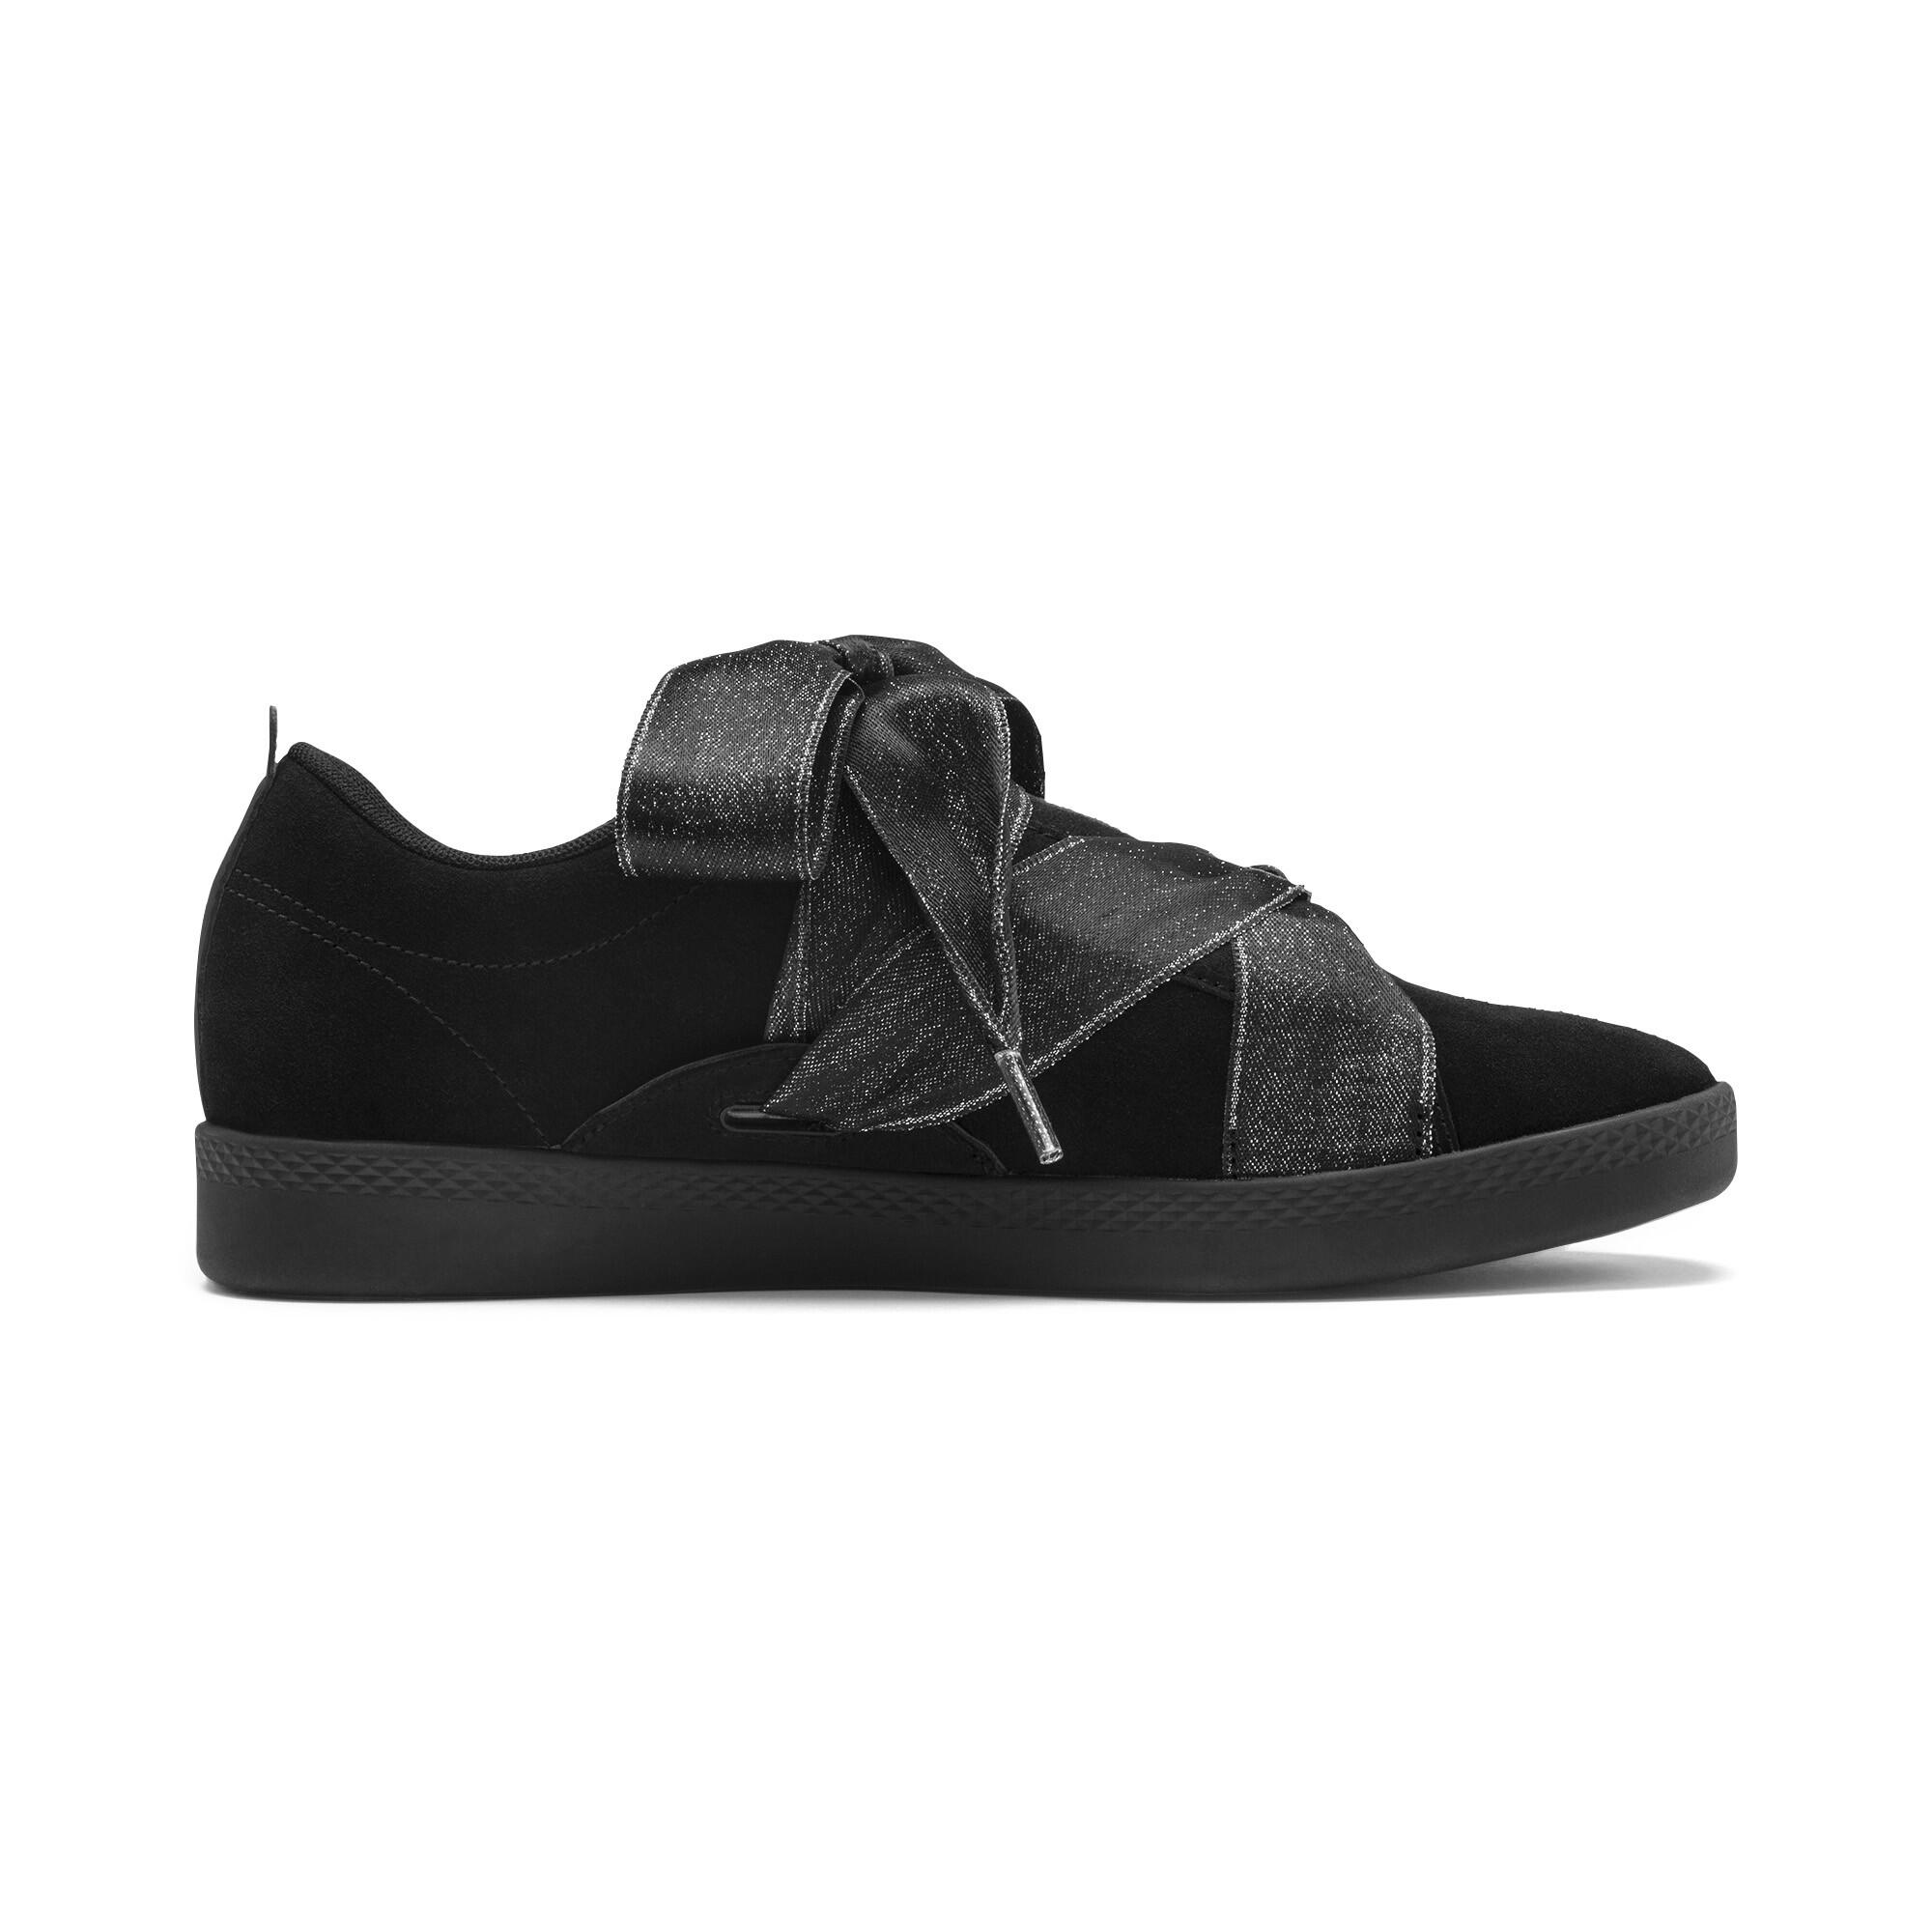 PUMA-PUMA-Smash-Astral-Buckle-Women-s-Sneakers-Women-Shoe-Basics thumbnail 14